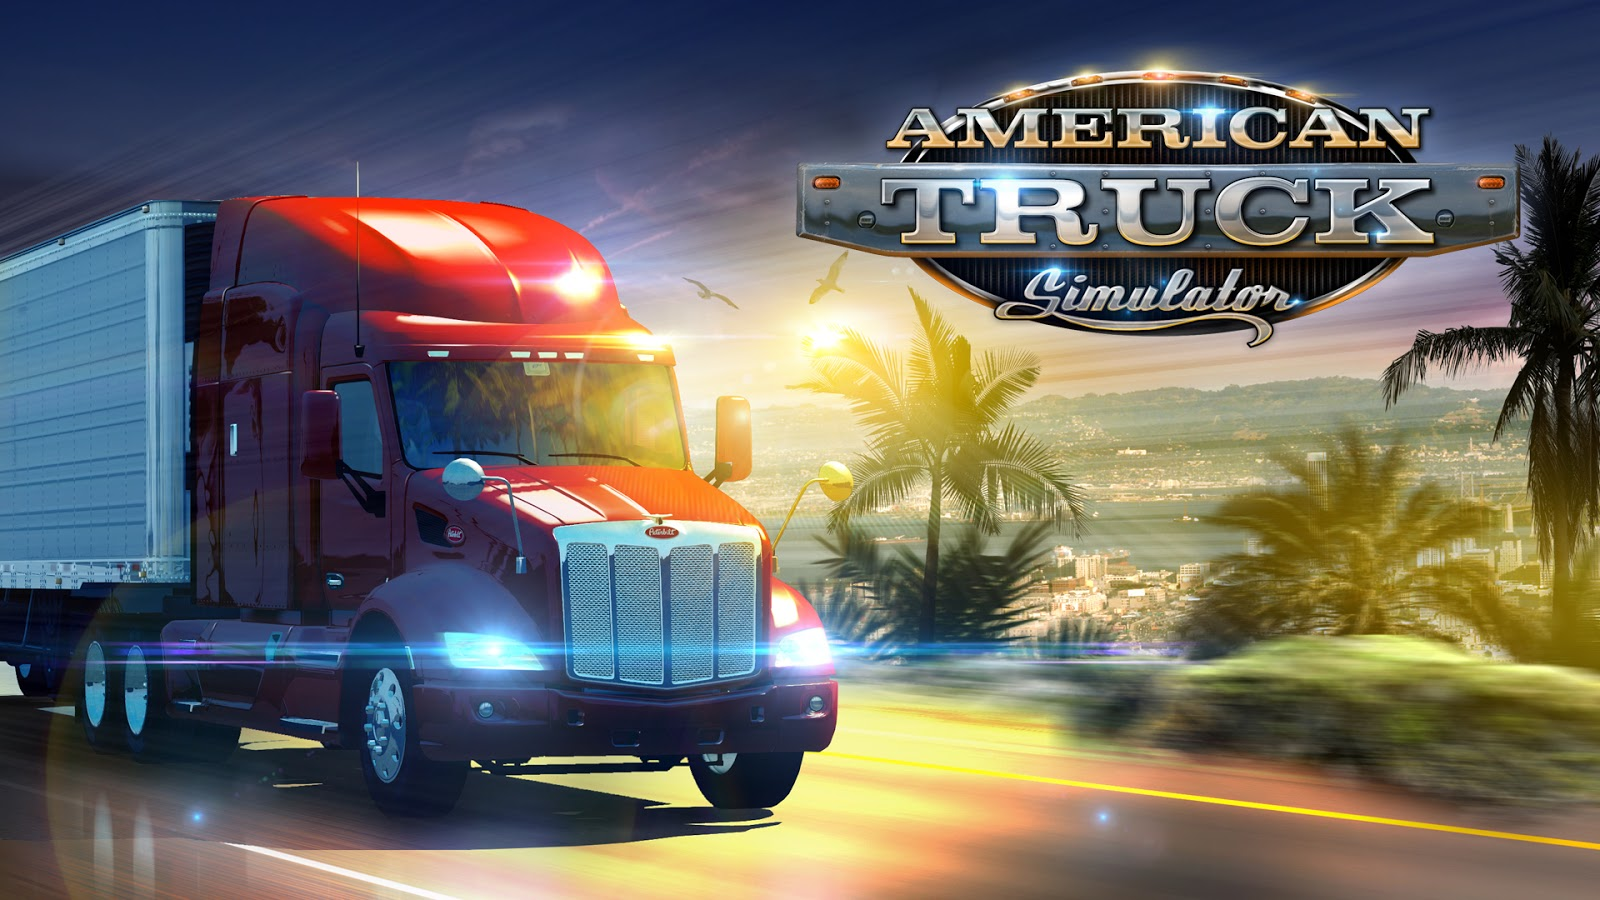 American Truck Simulator v1.29.1.17s & DLC Is Here! [Latest][Legit DLC Unlocker]